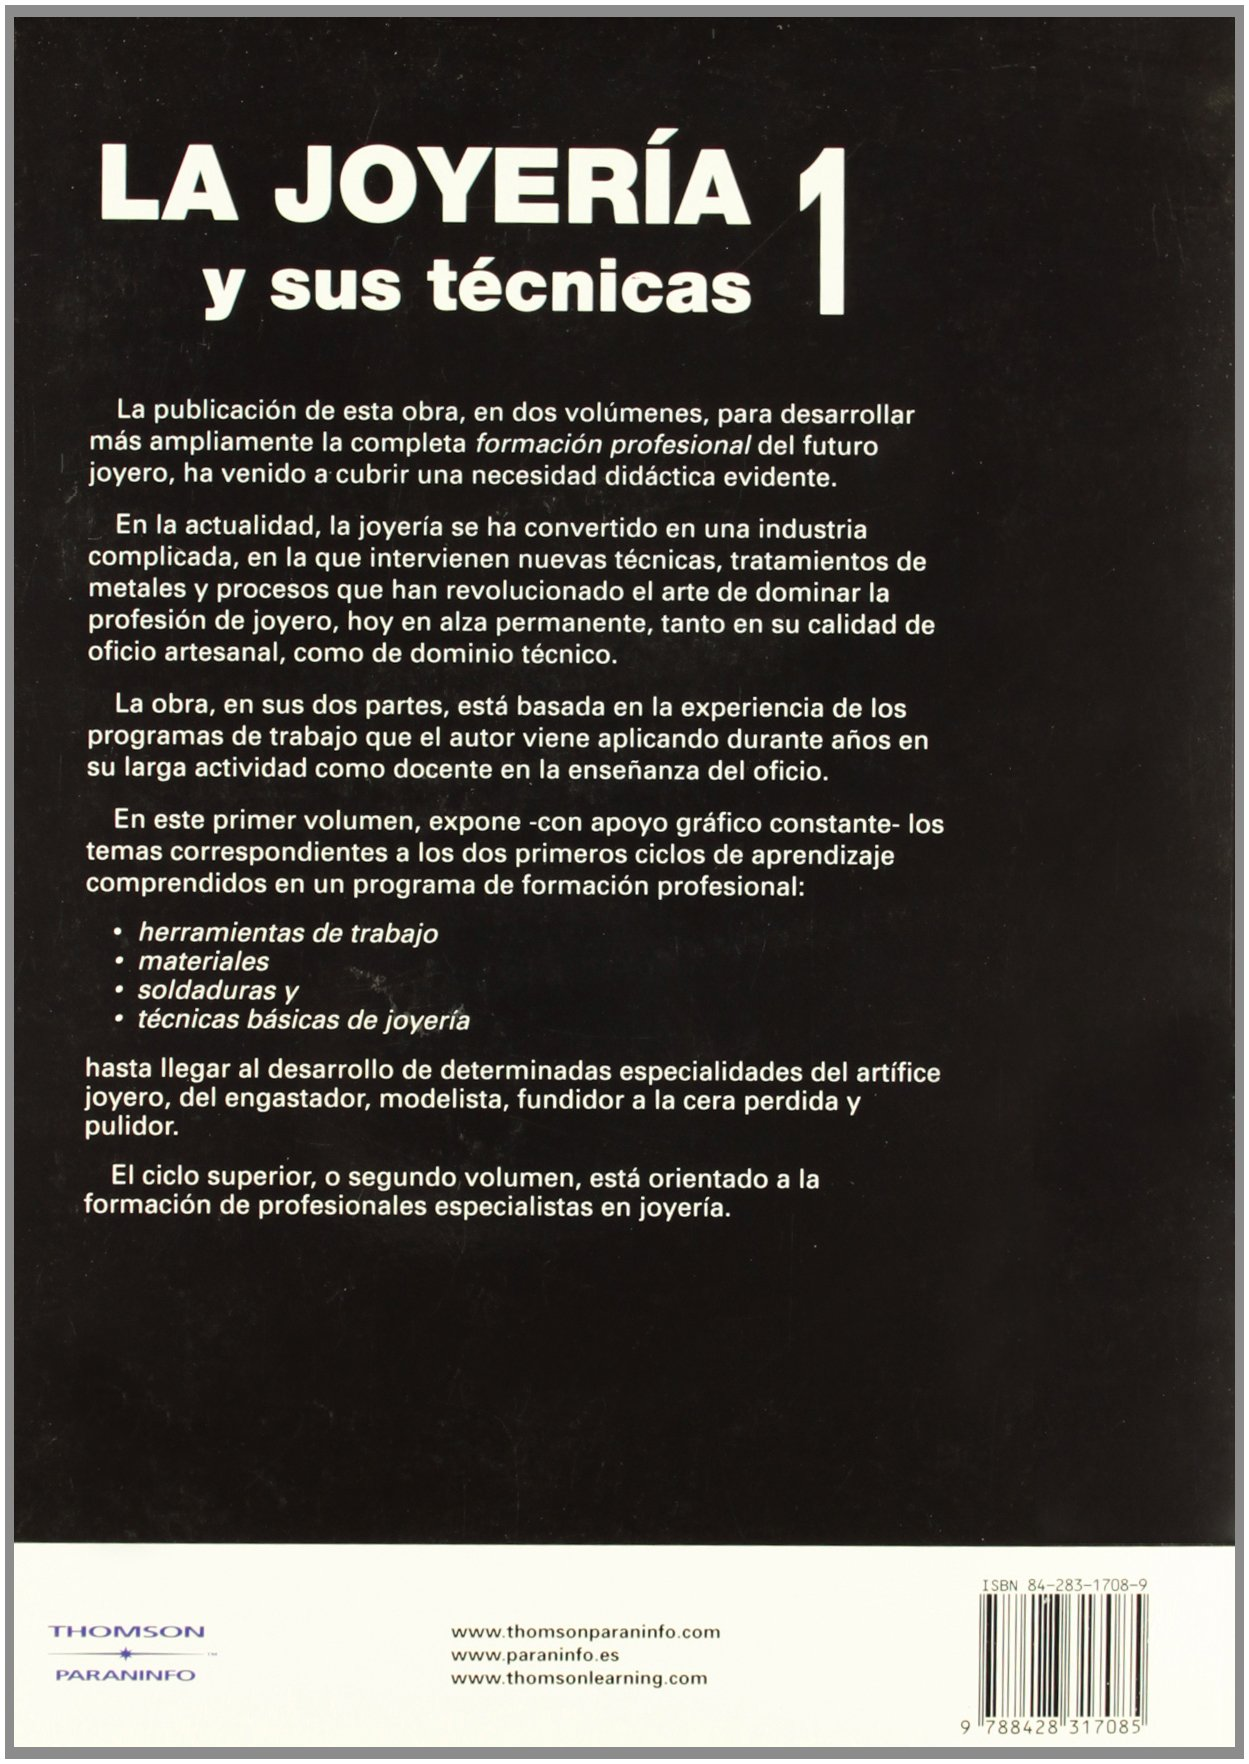 La Joyeria y Sus Tecnicas 1 (Spanish Edition): J. L. Llorente: 9788428317085: Amazon.com: Books